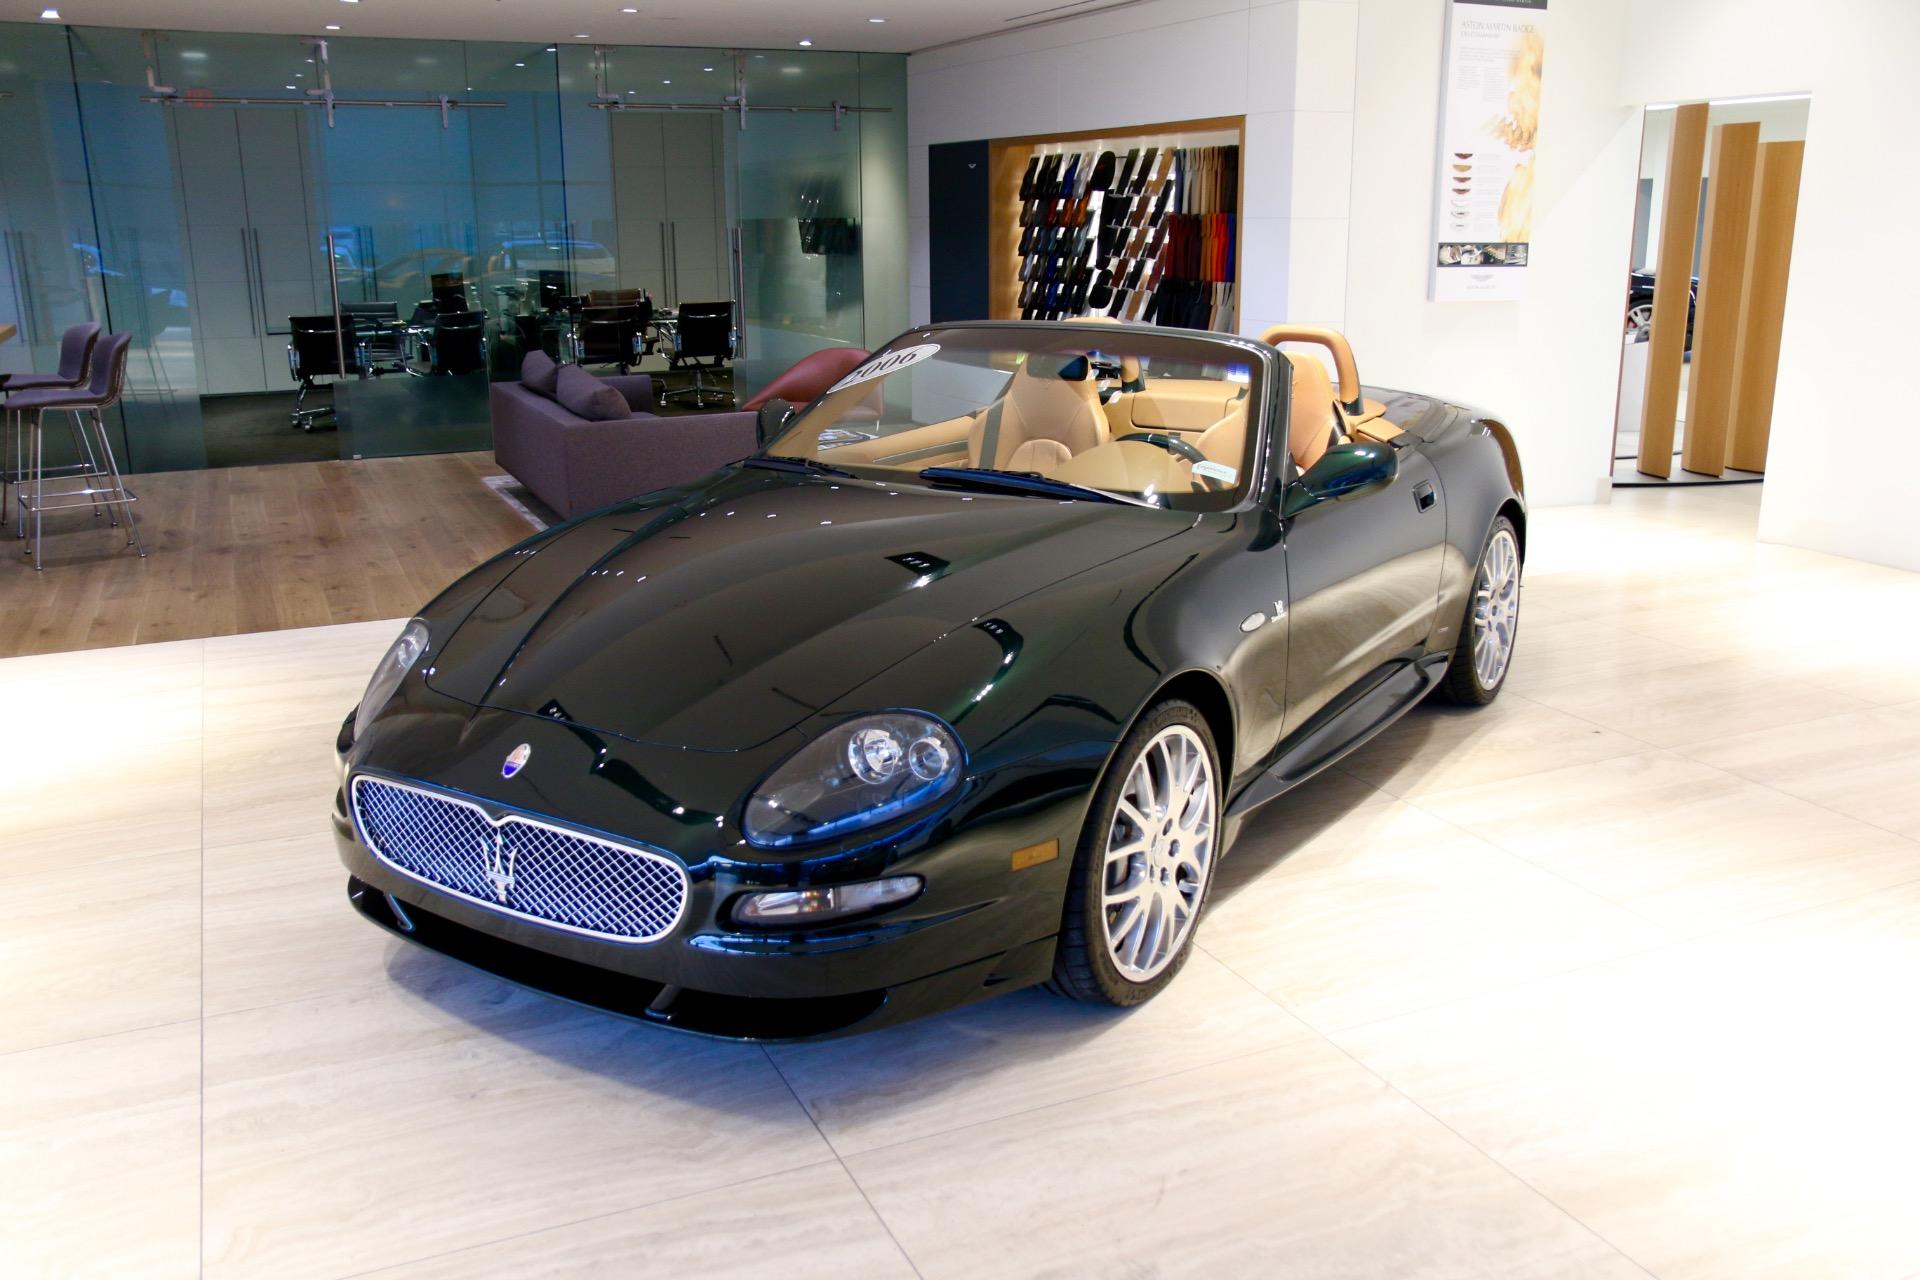 https://www.exclusiveautomotivegroup.com/galleria_images/1164/1164_p3_l.jpg